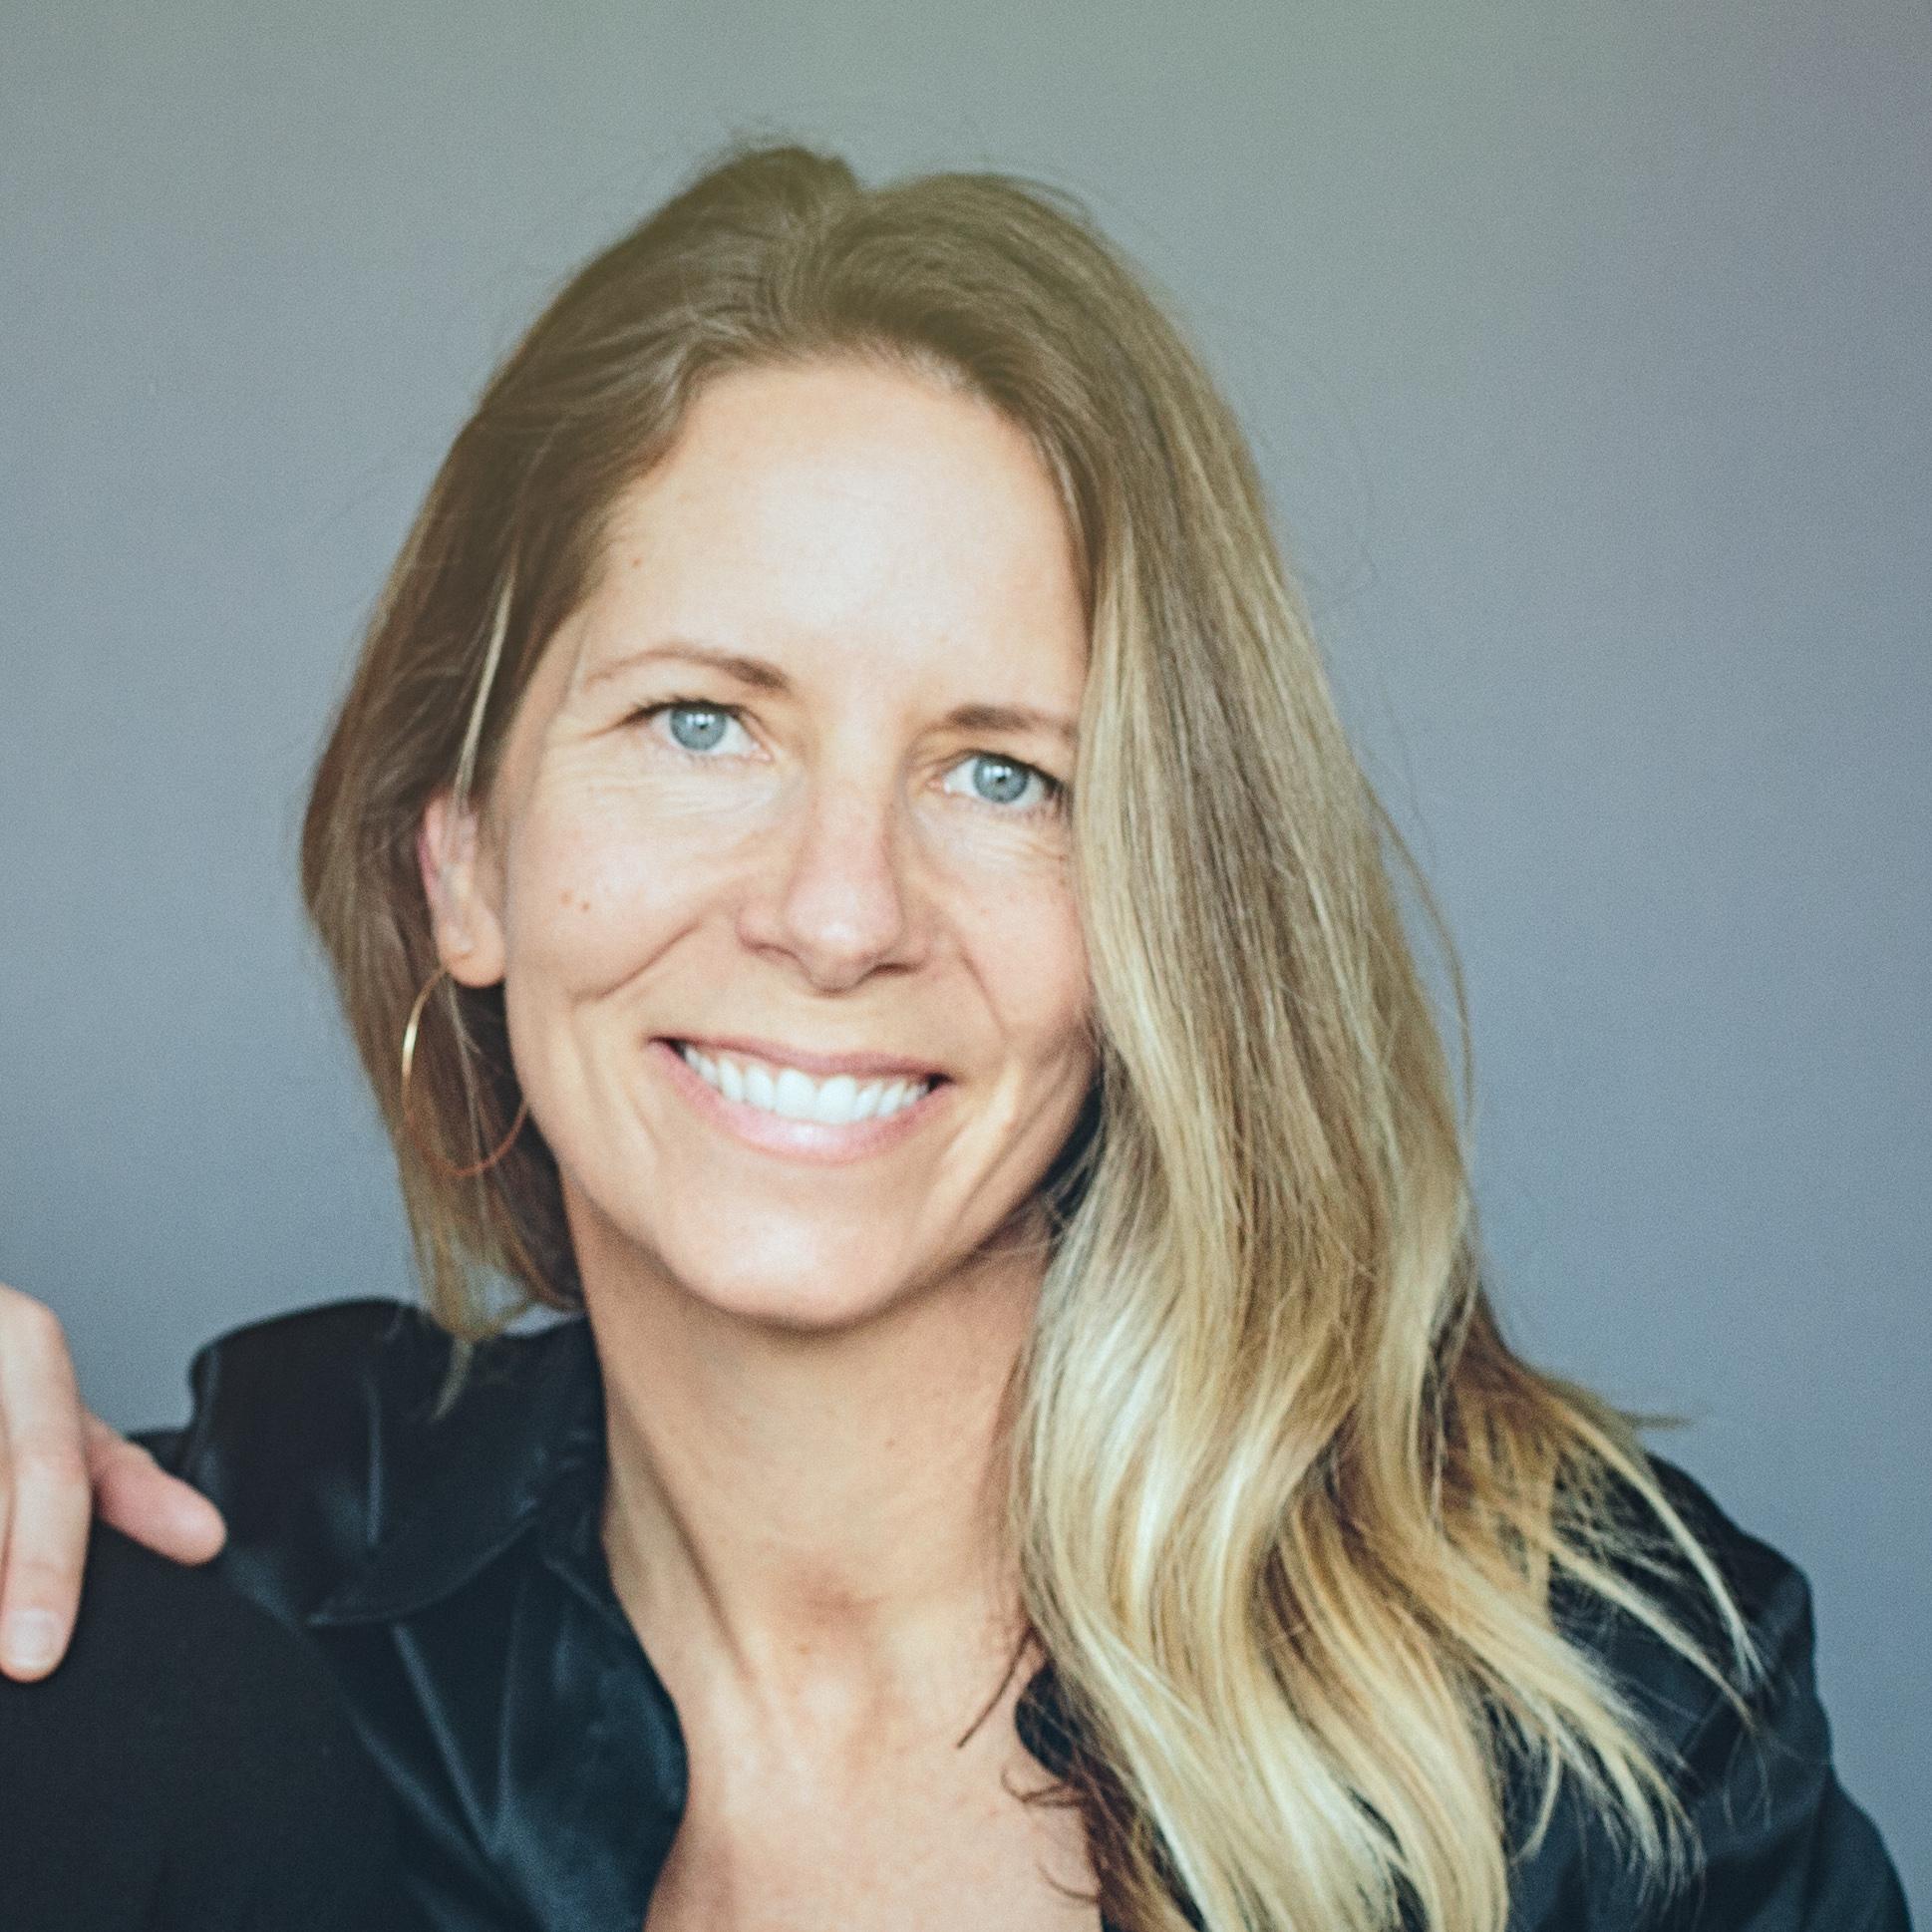 ERIKA PETERMAN | Board Vice President